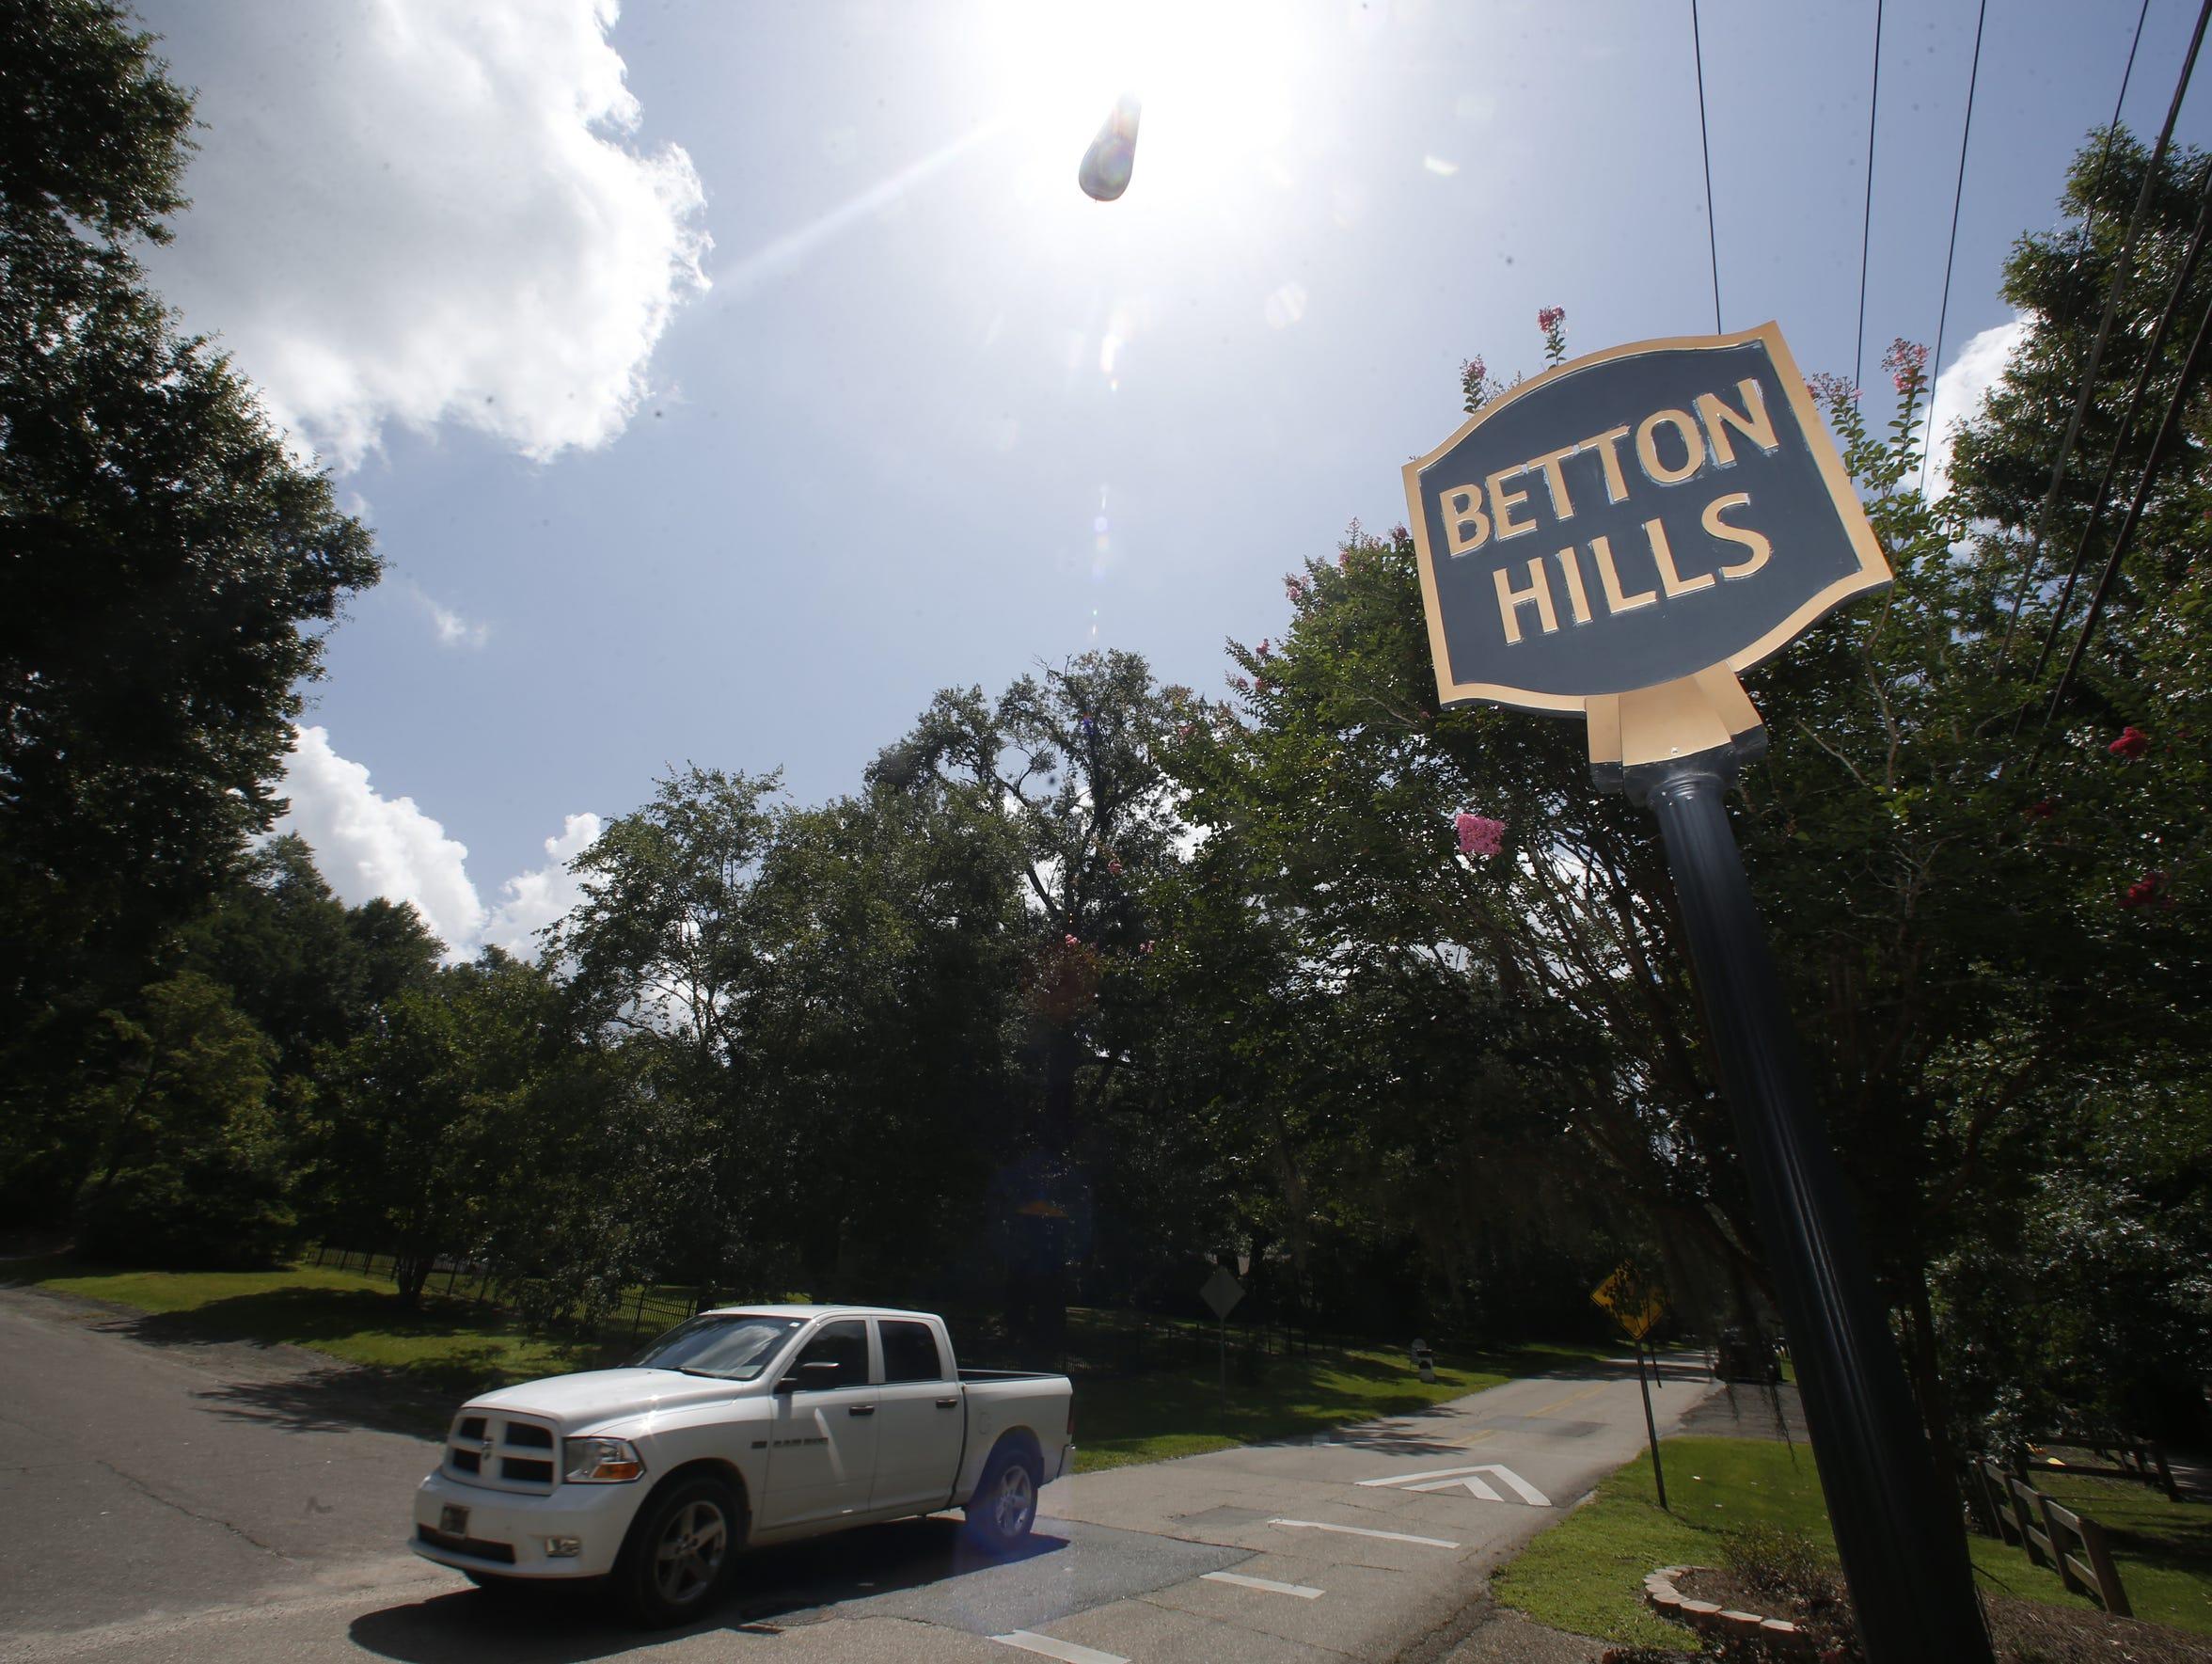 The Betton Hills neighborhood was home to  Florida